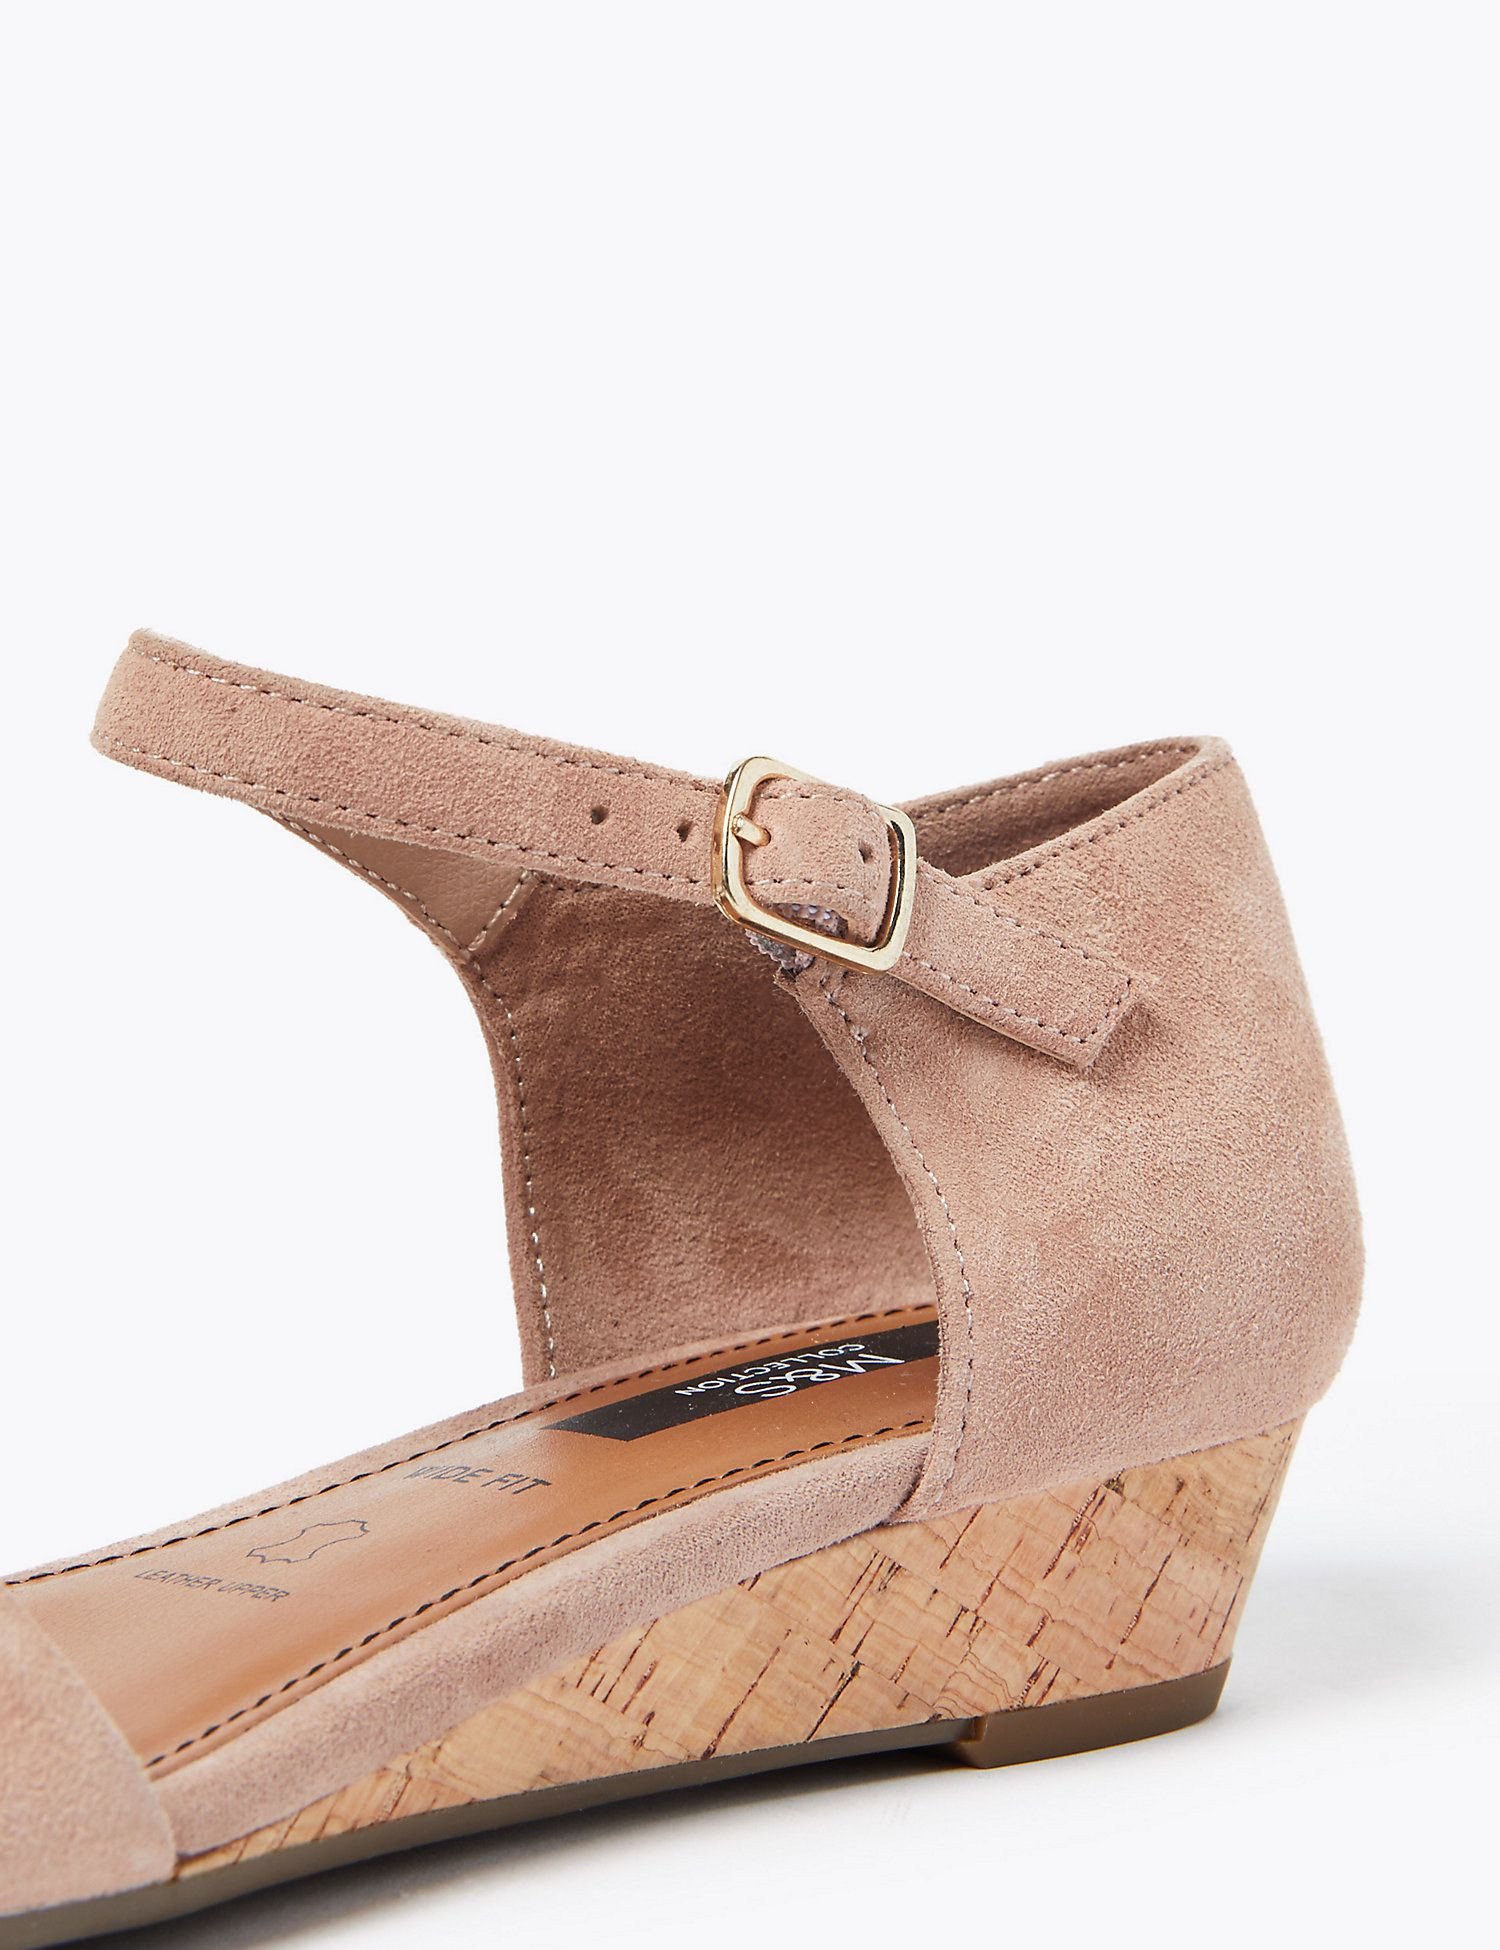 Wide Fit Suede Wedge Sandals | M\u0026S